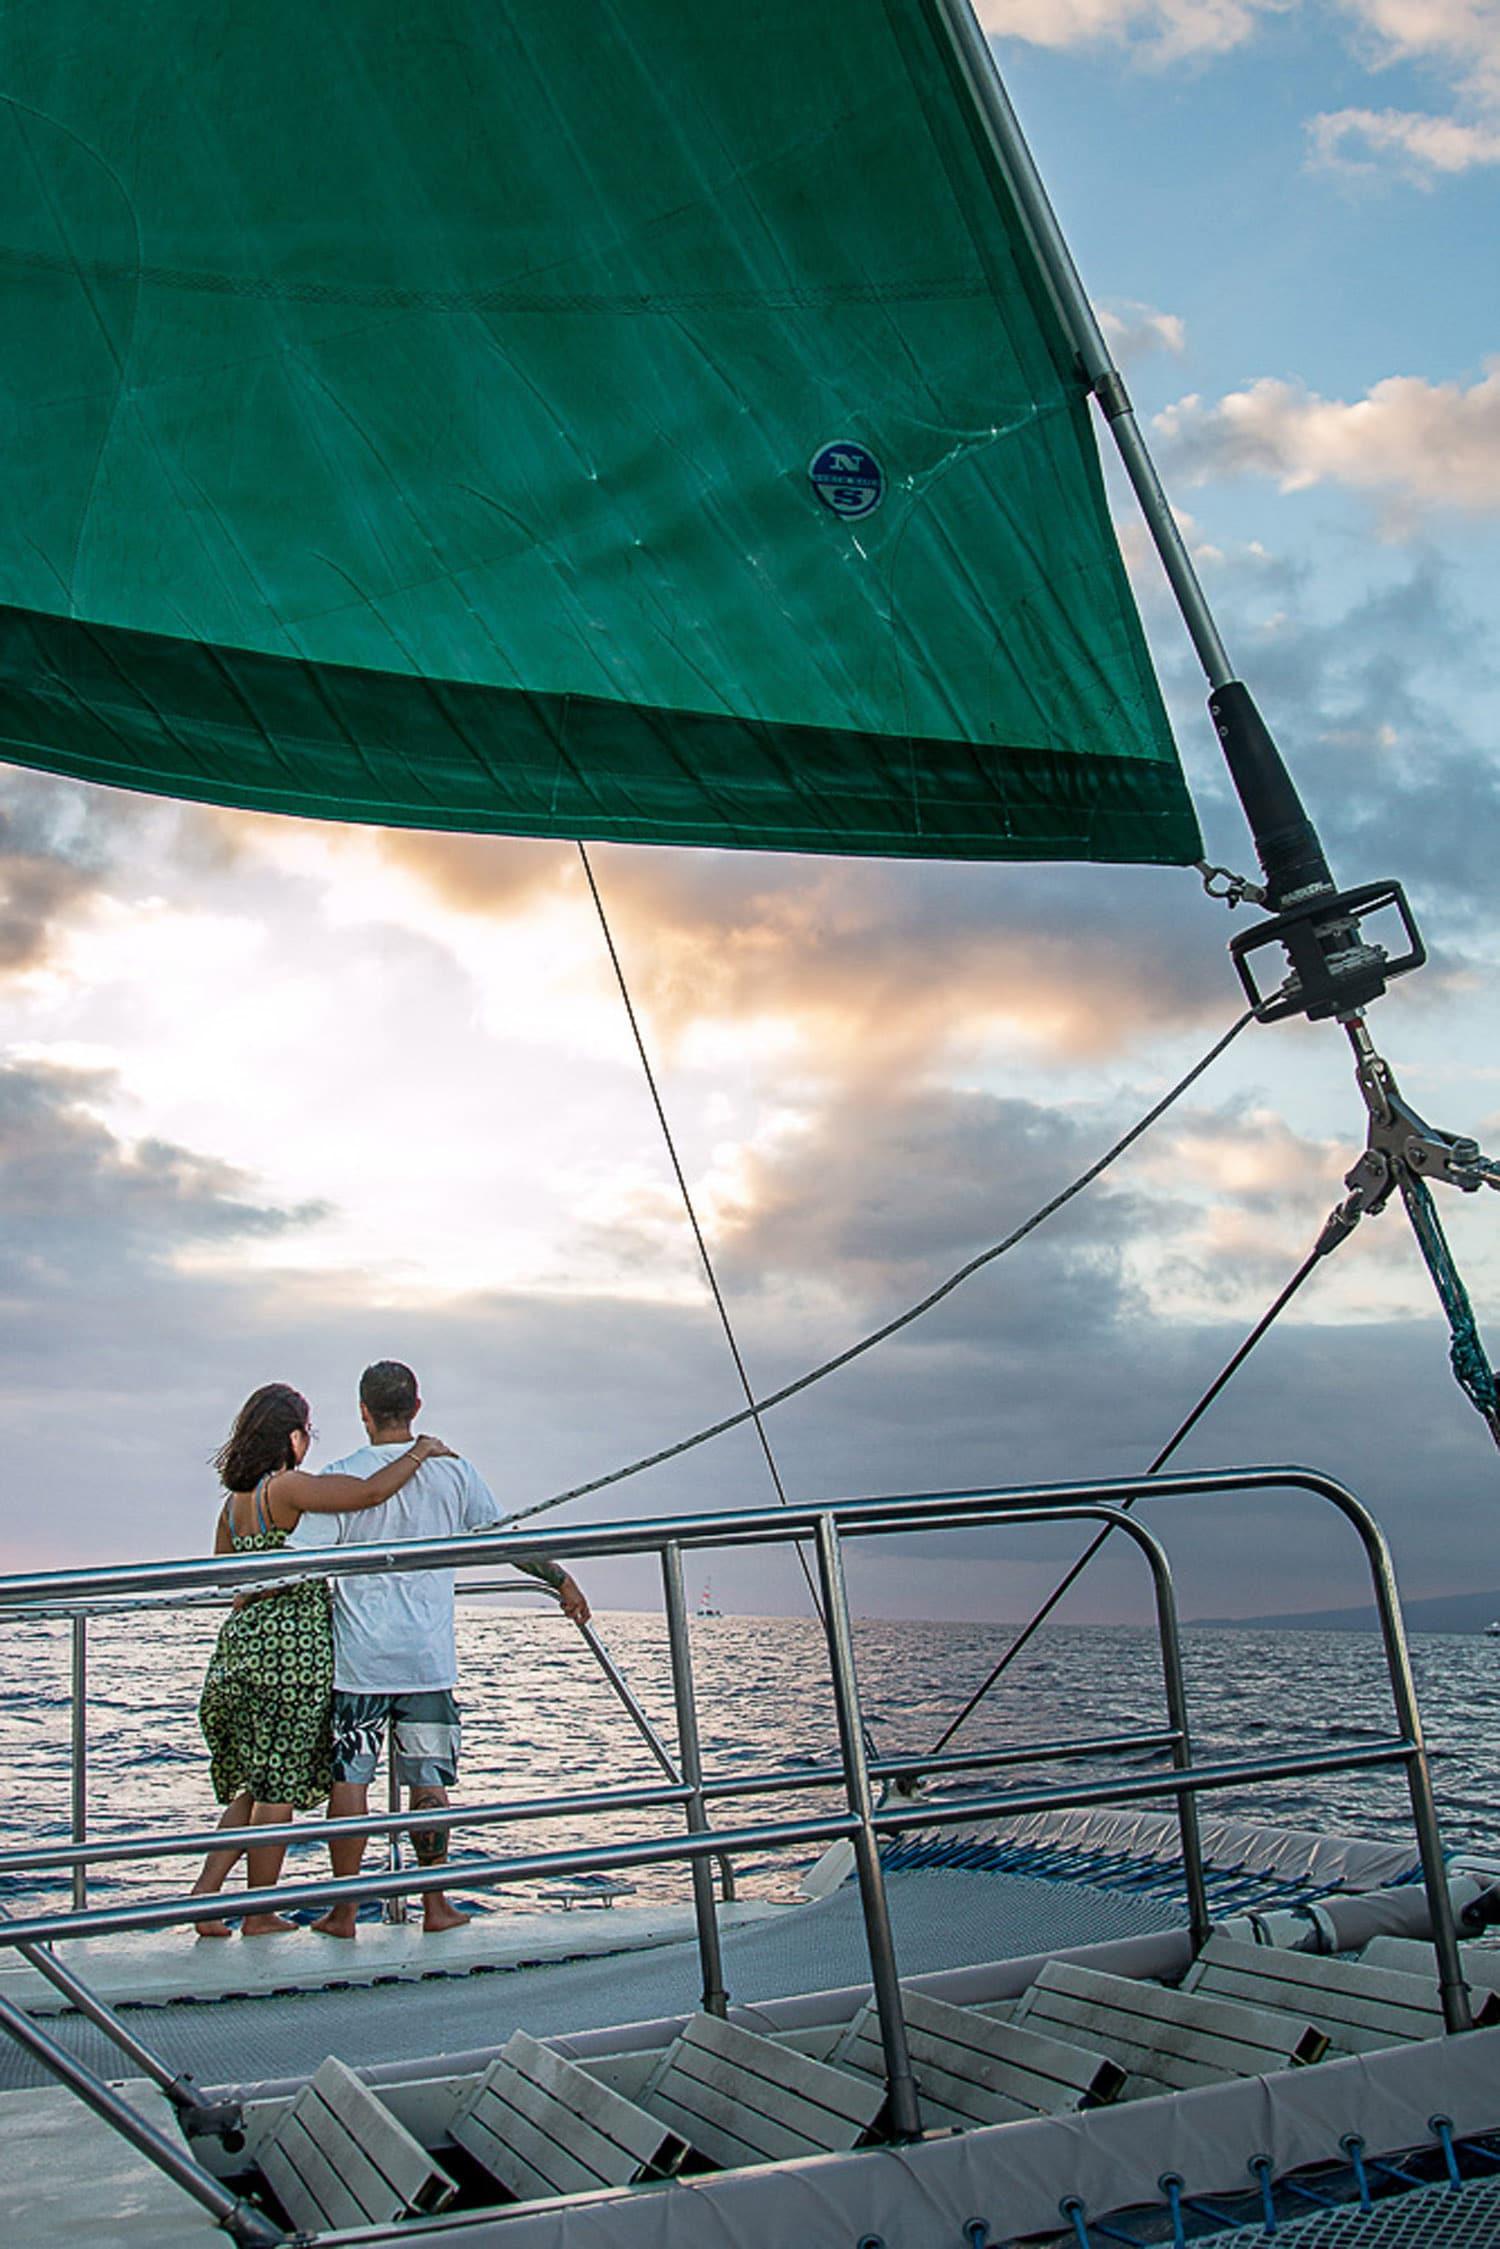 Oahu Catameran